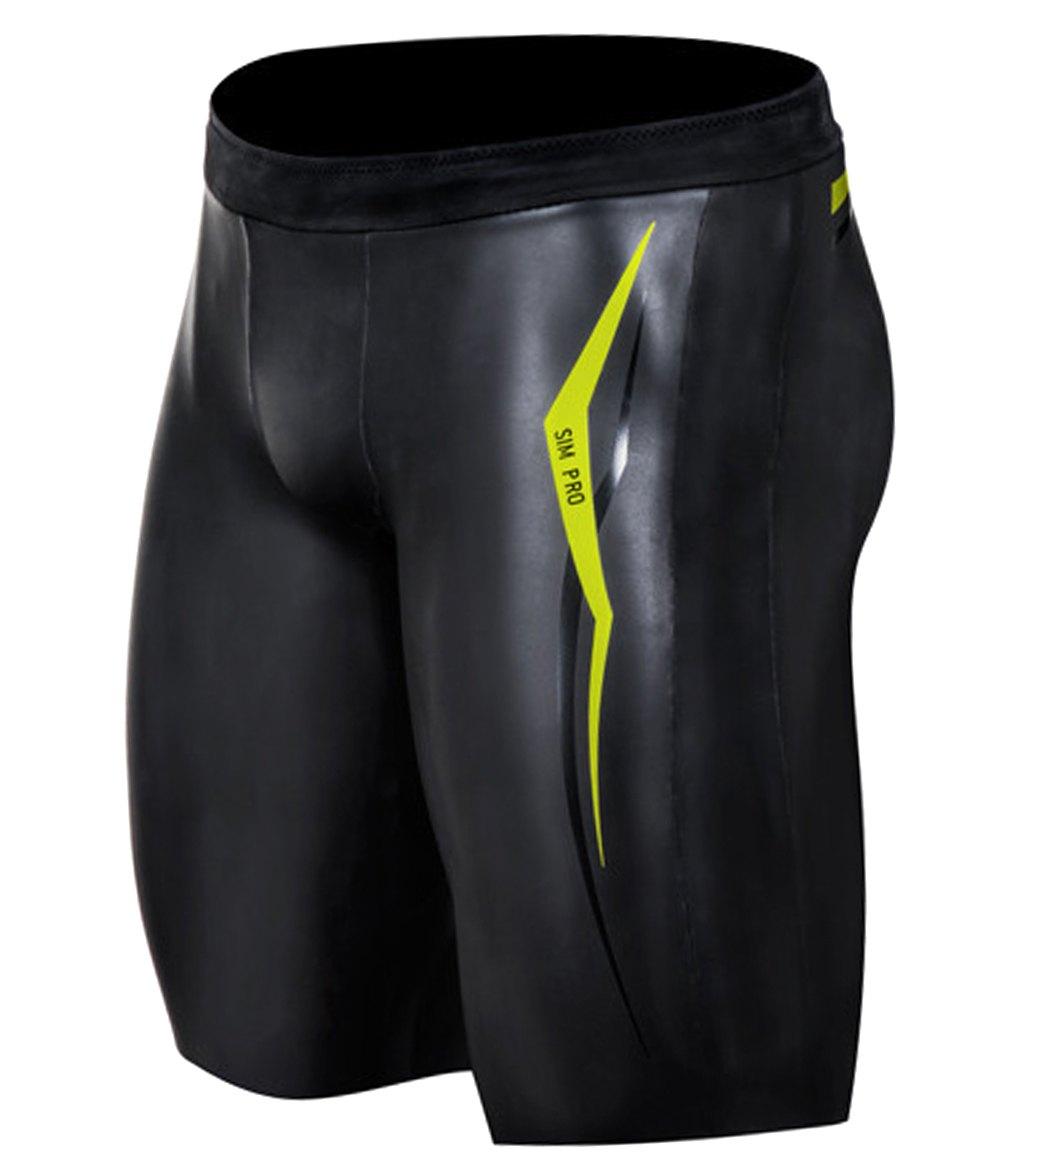 f39040a207 ROKA Sports Men's SIM Pro II Neoprene Shorts at SwimOutlet.com ...